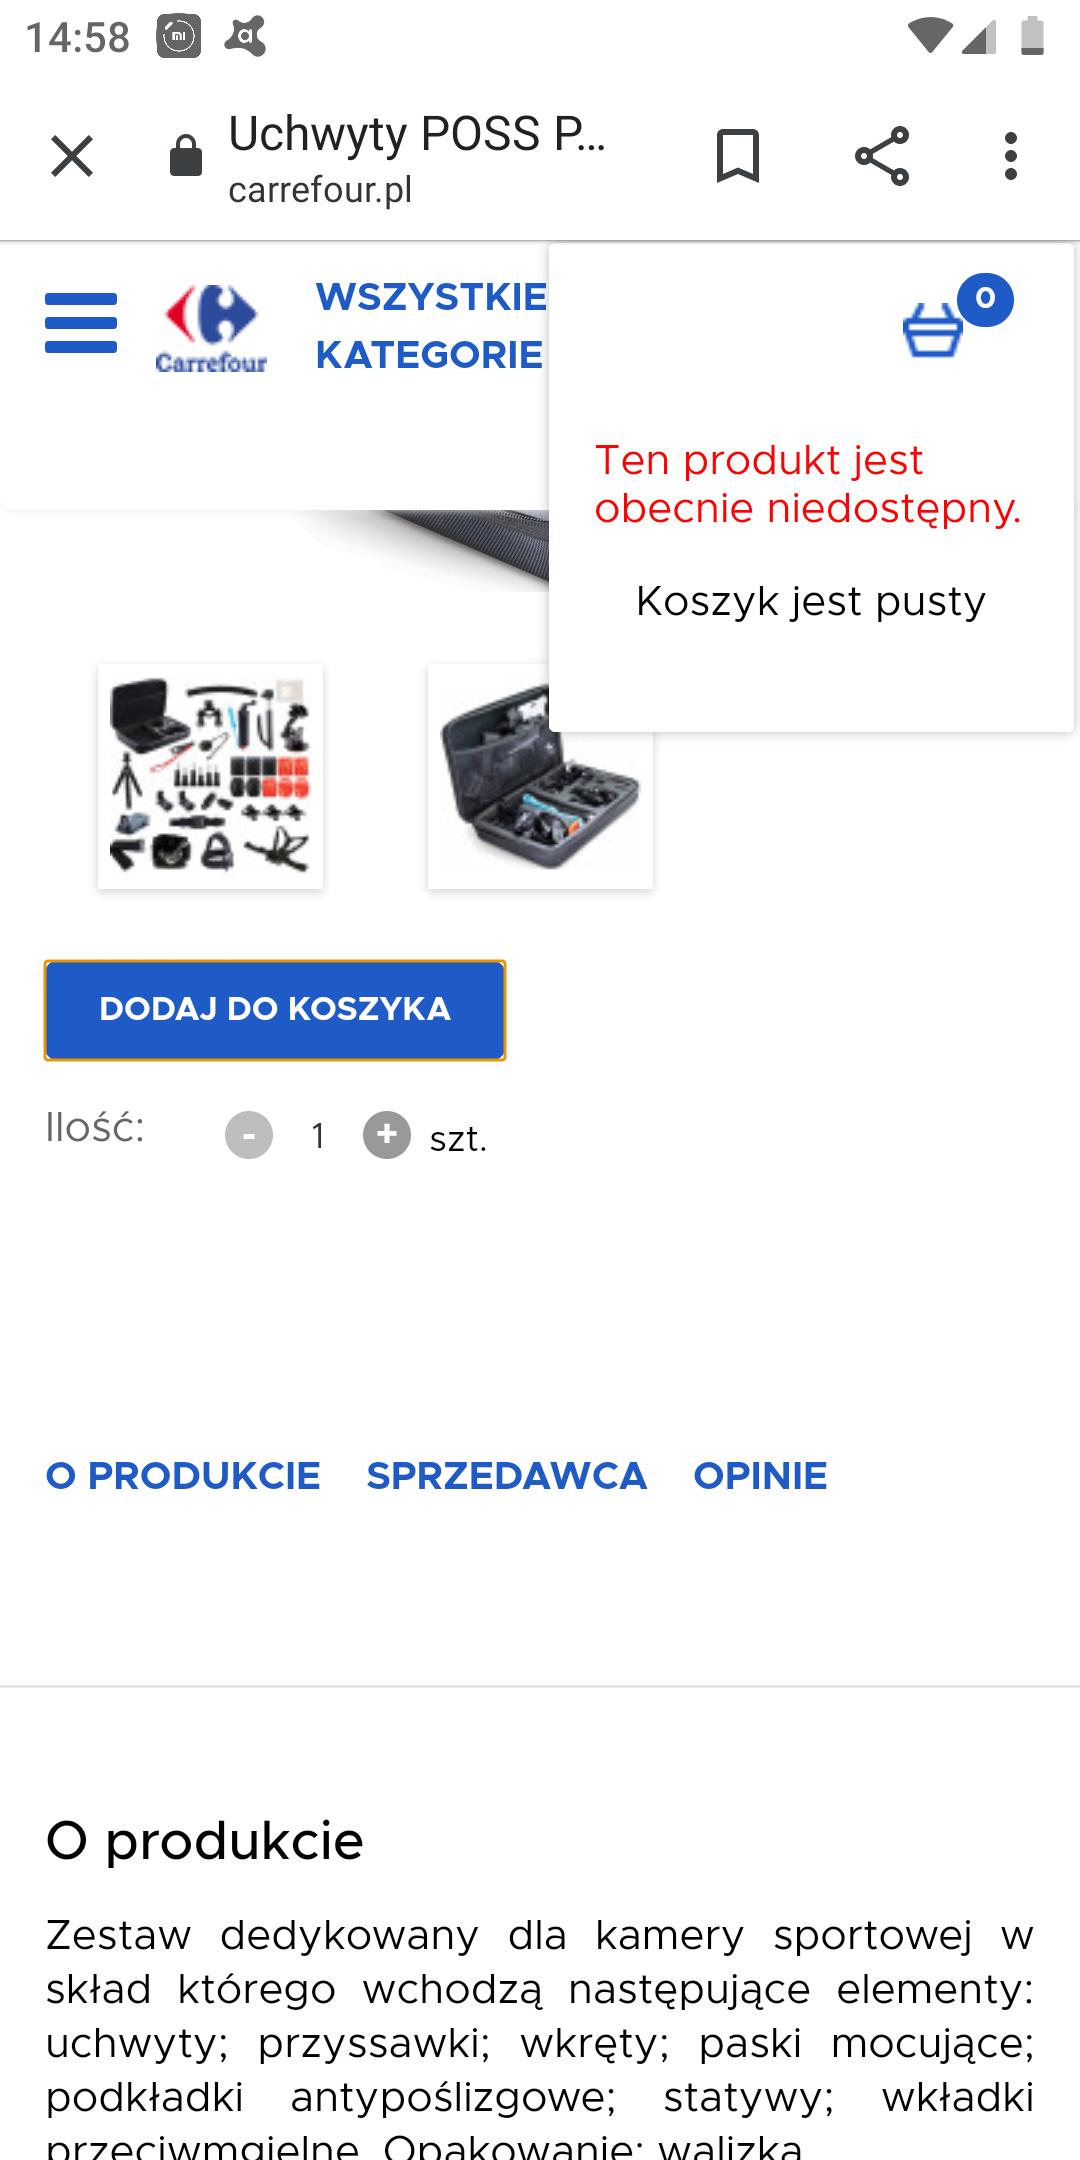 2706802-yLbSK.jpg